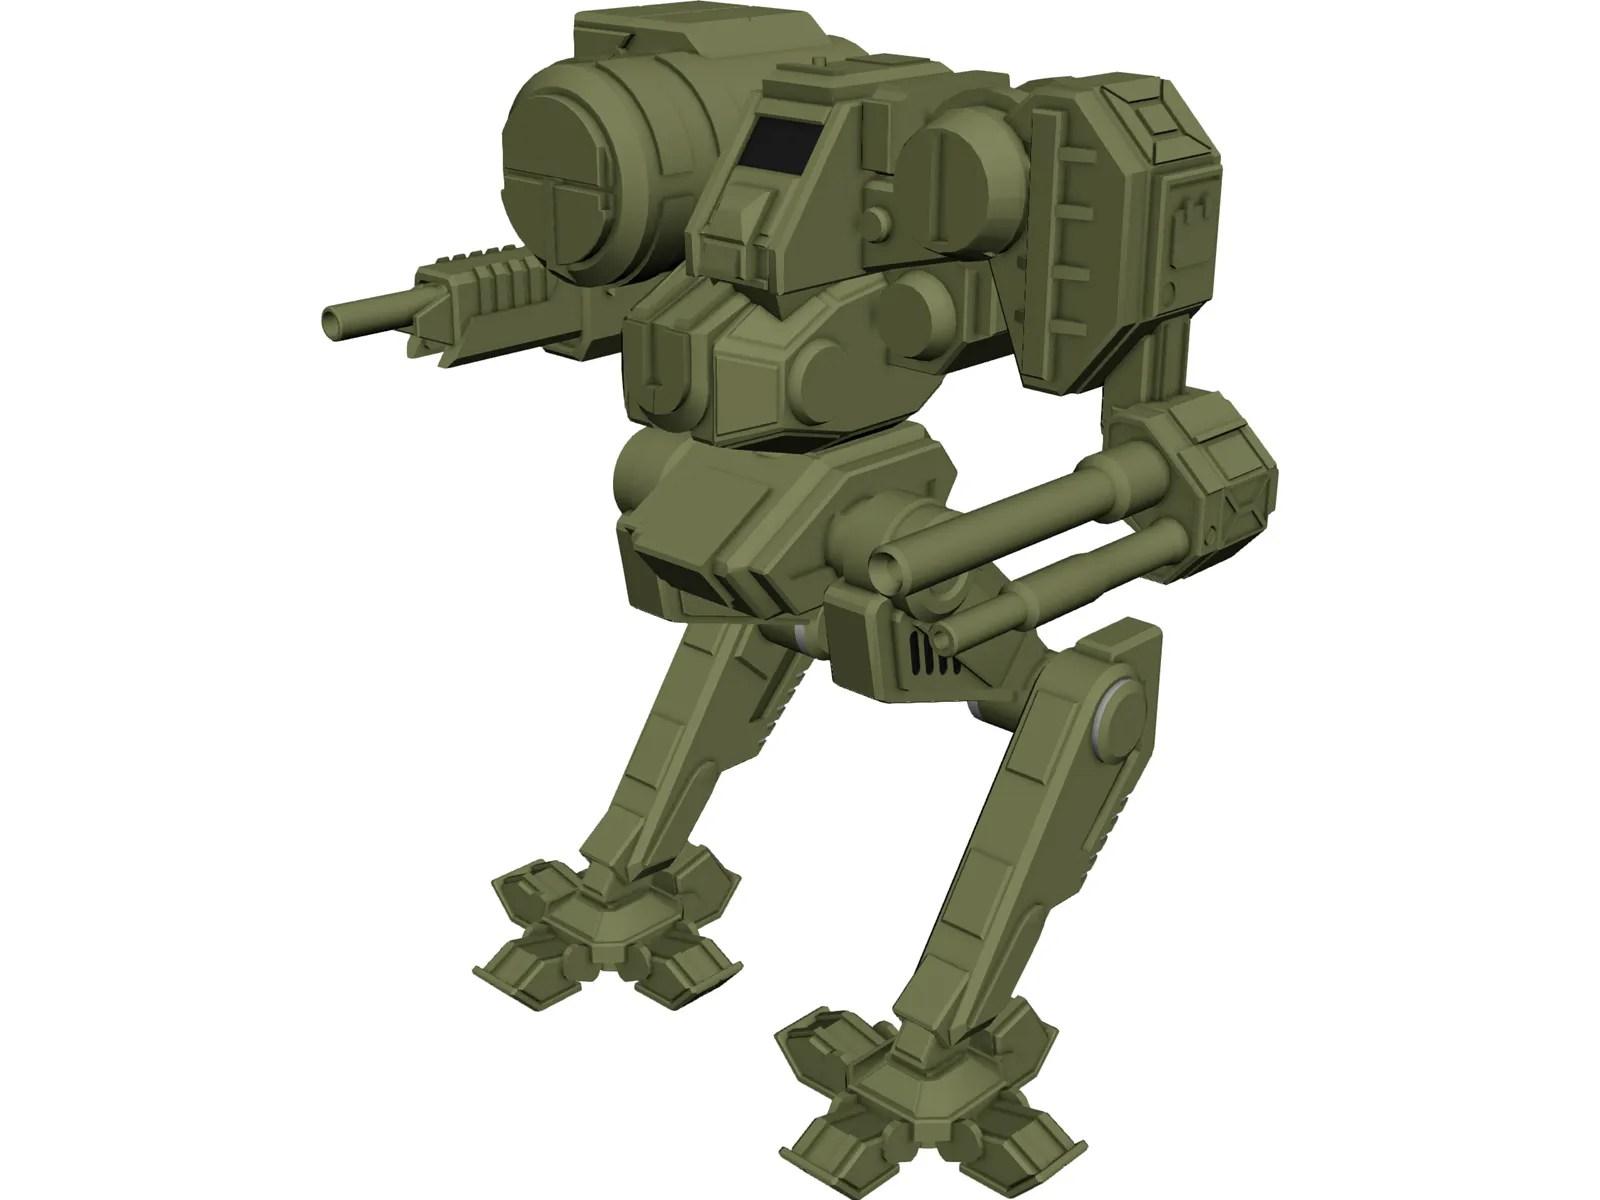 chimera battletech 3d model